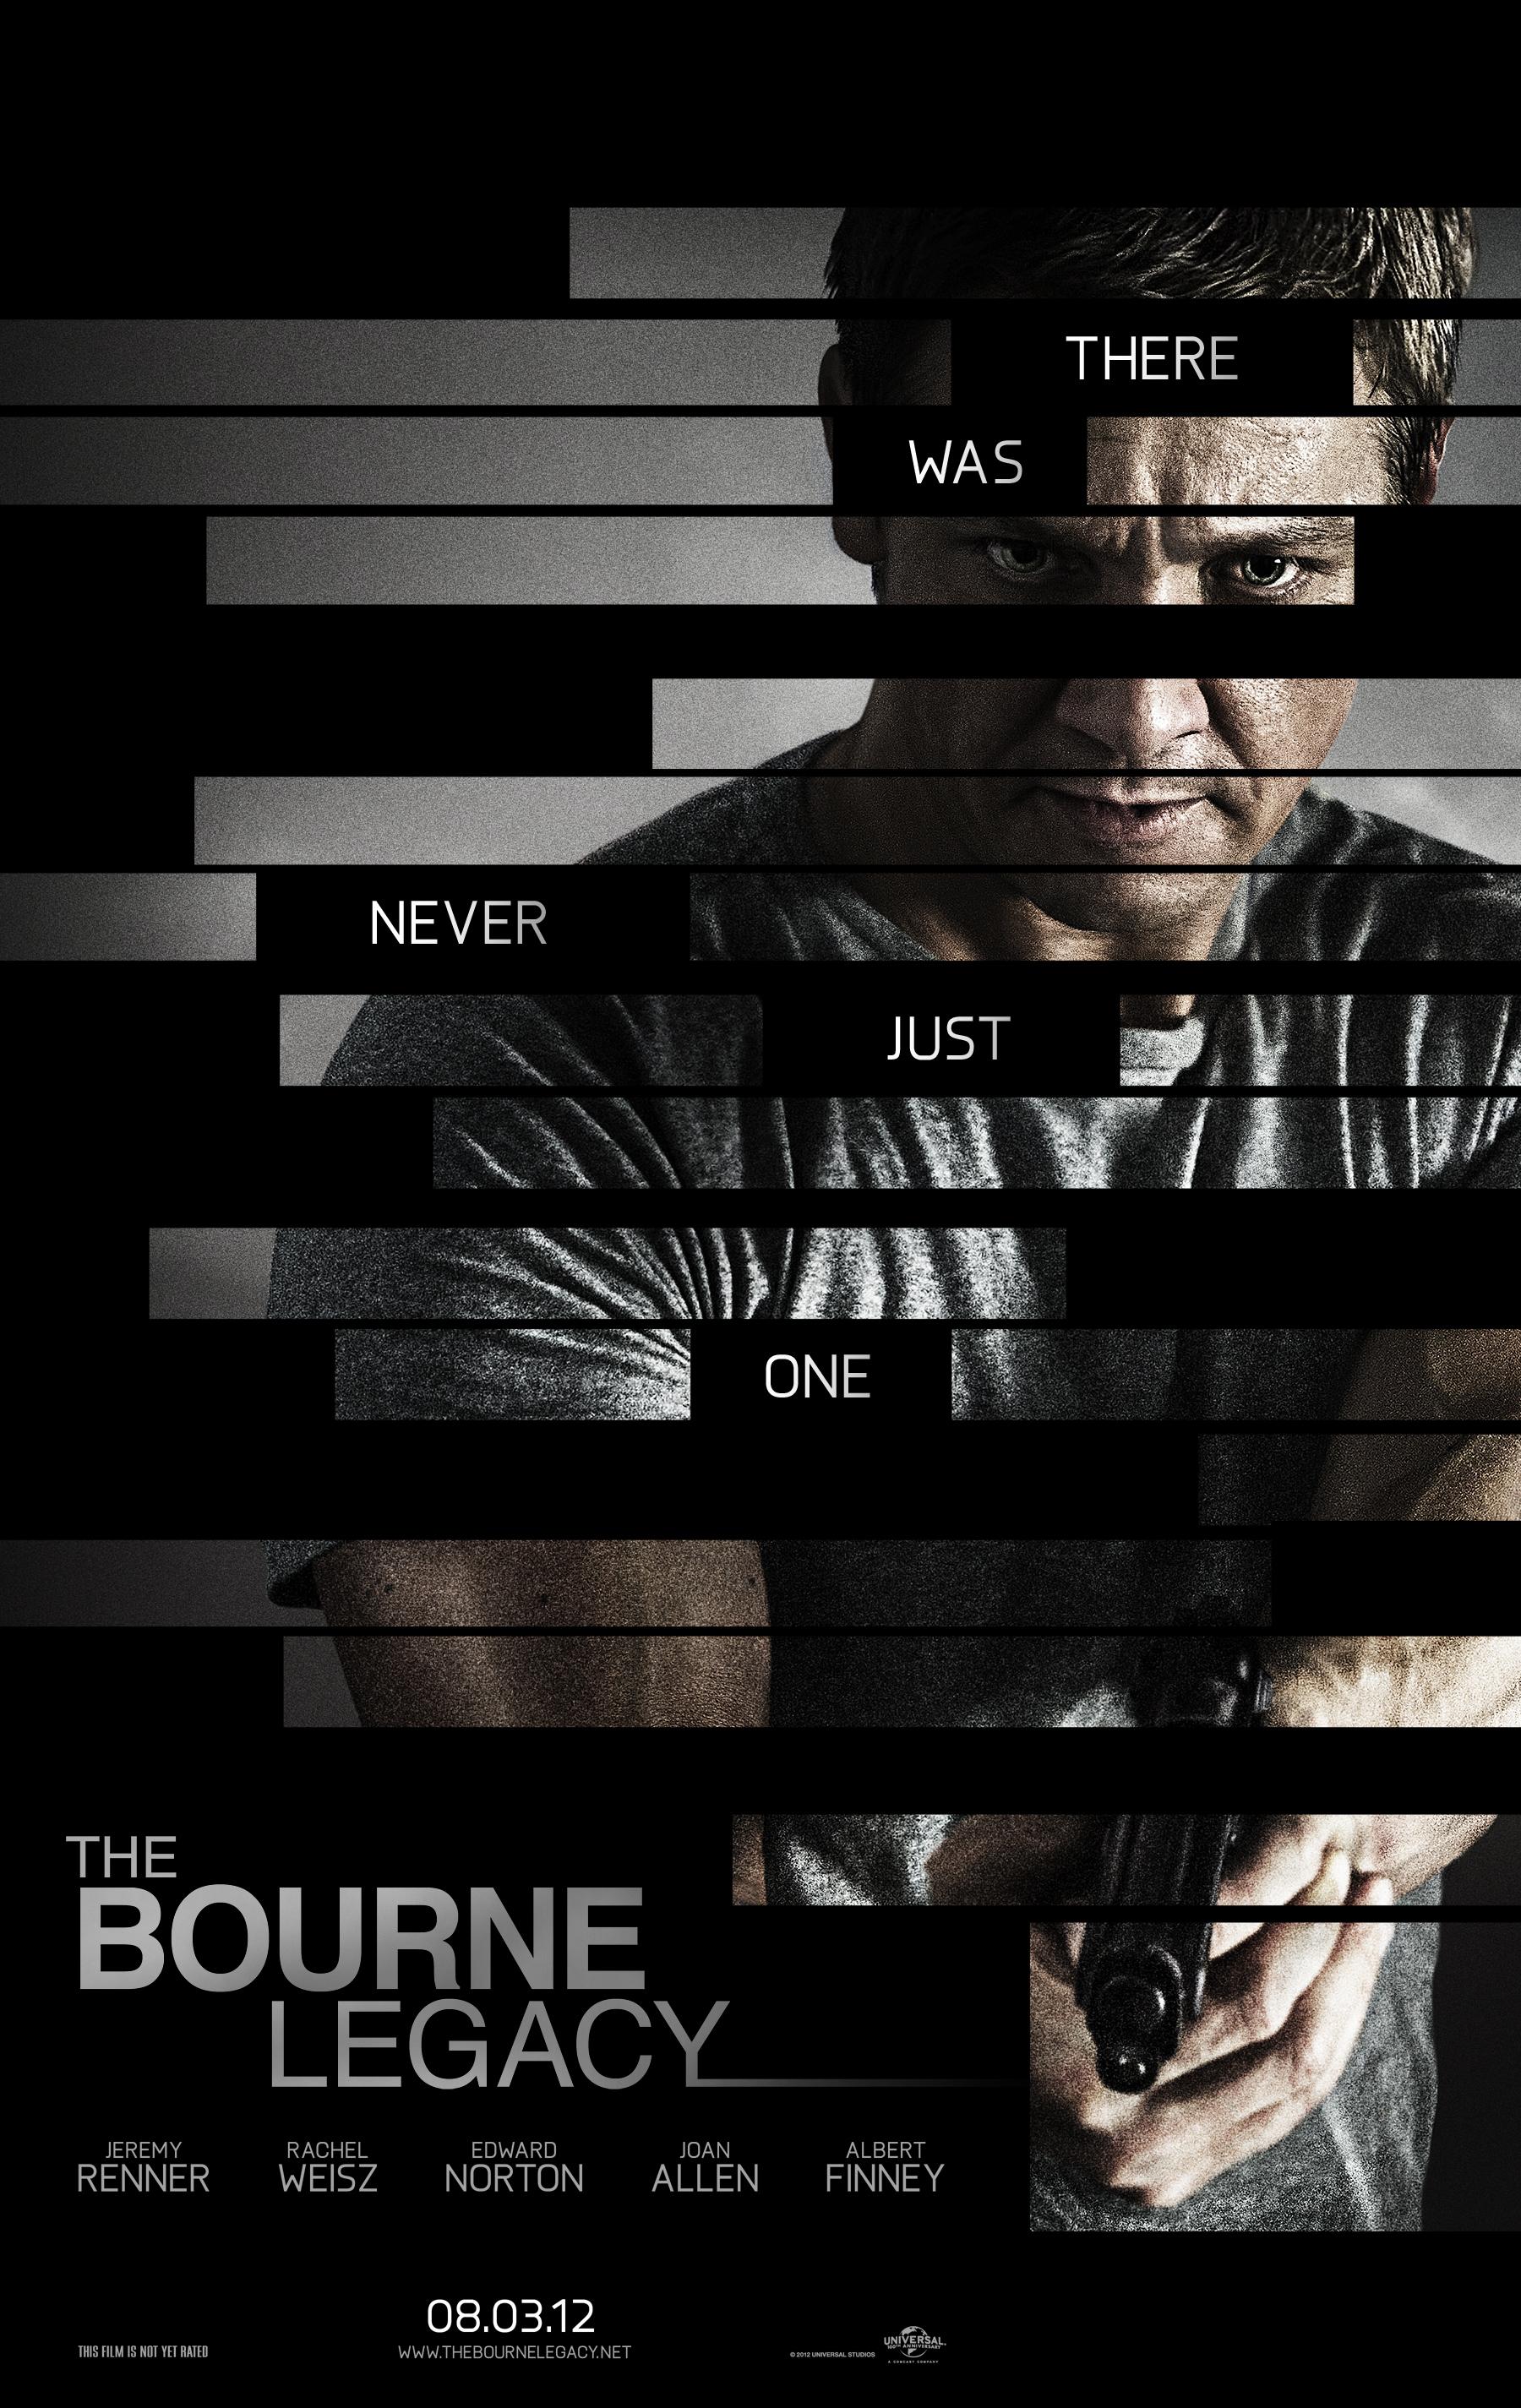 Bourne-Legacy-poster.jpg